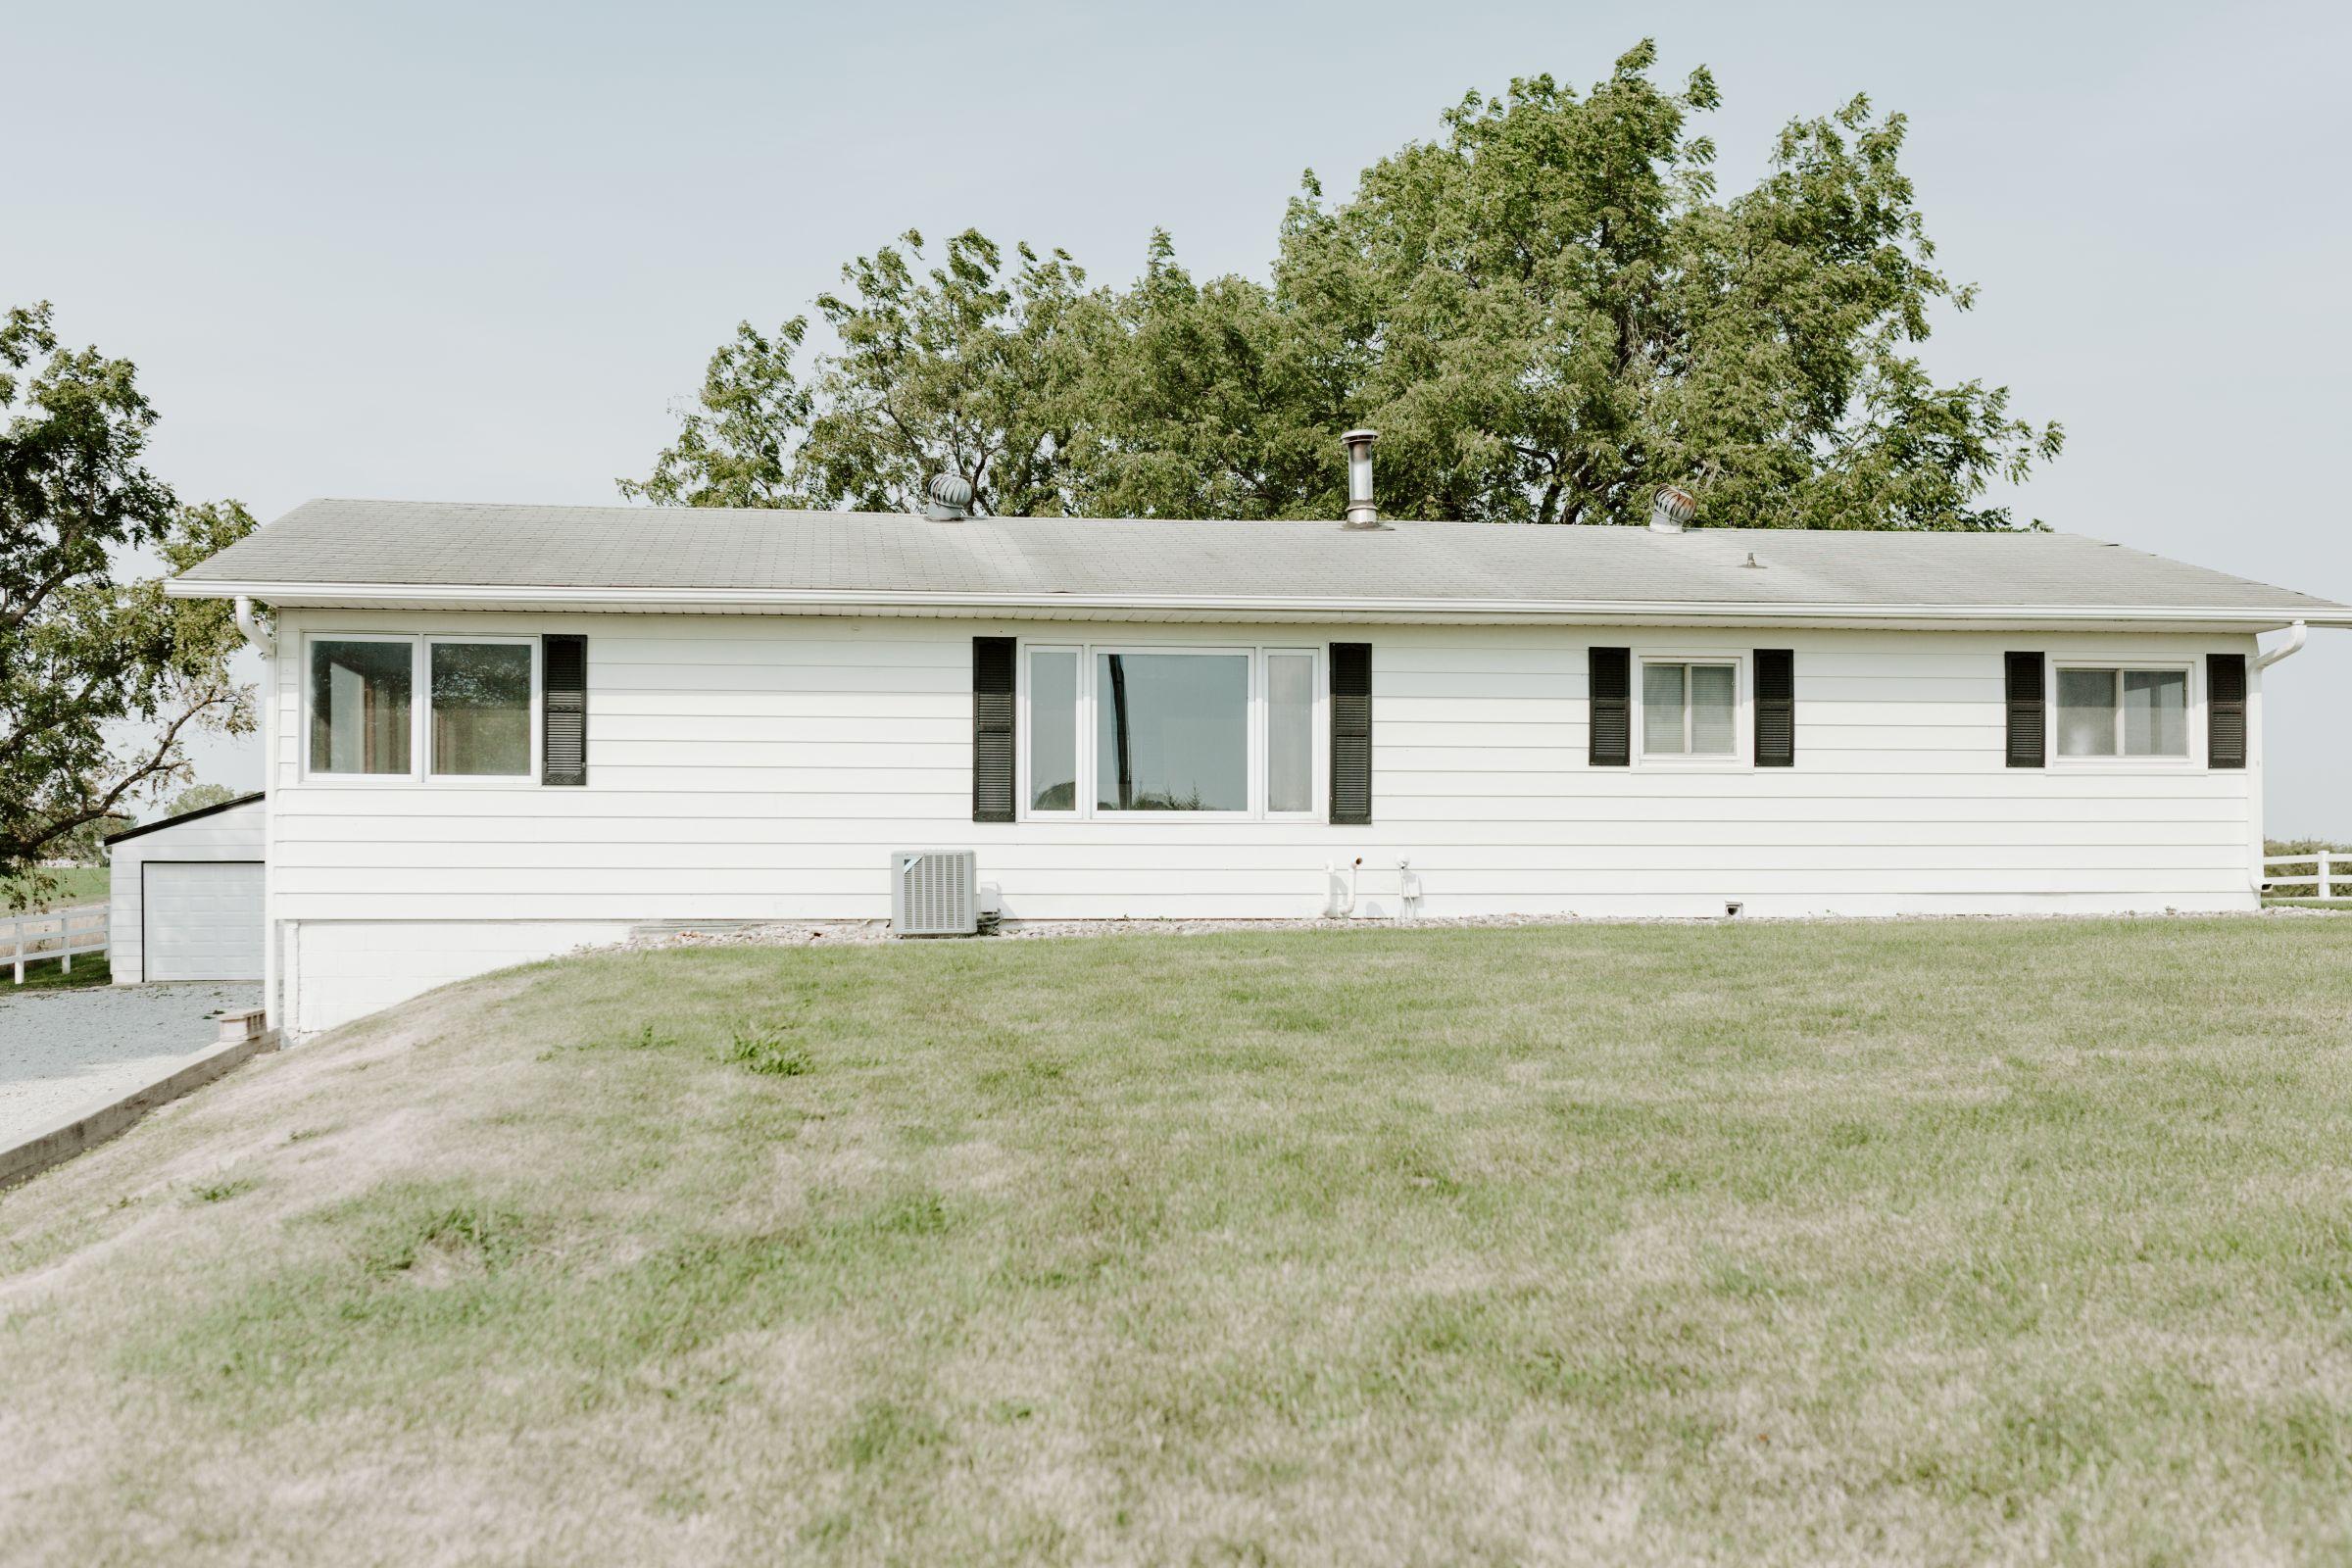 residential-warren-county-iowa-2-acres-listing-number-15743-0-2021-09-15-193730.jpg